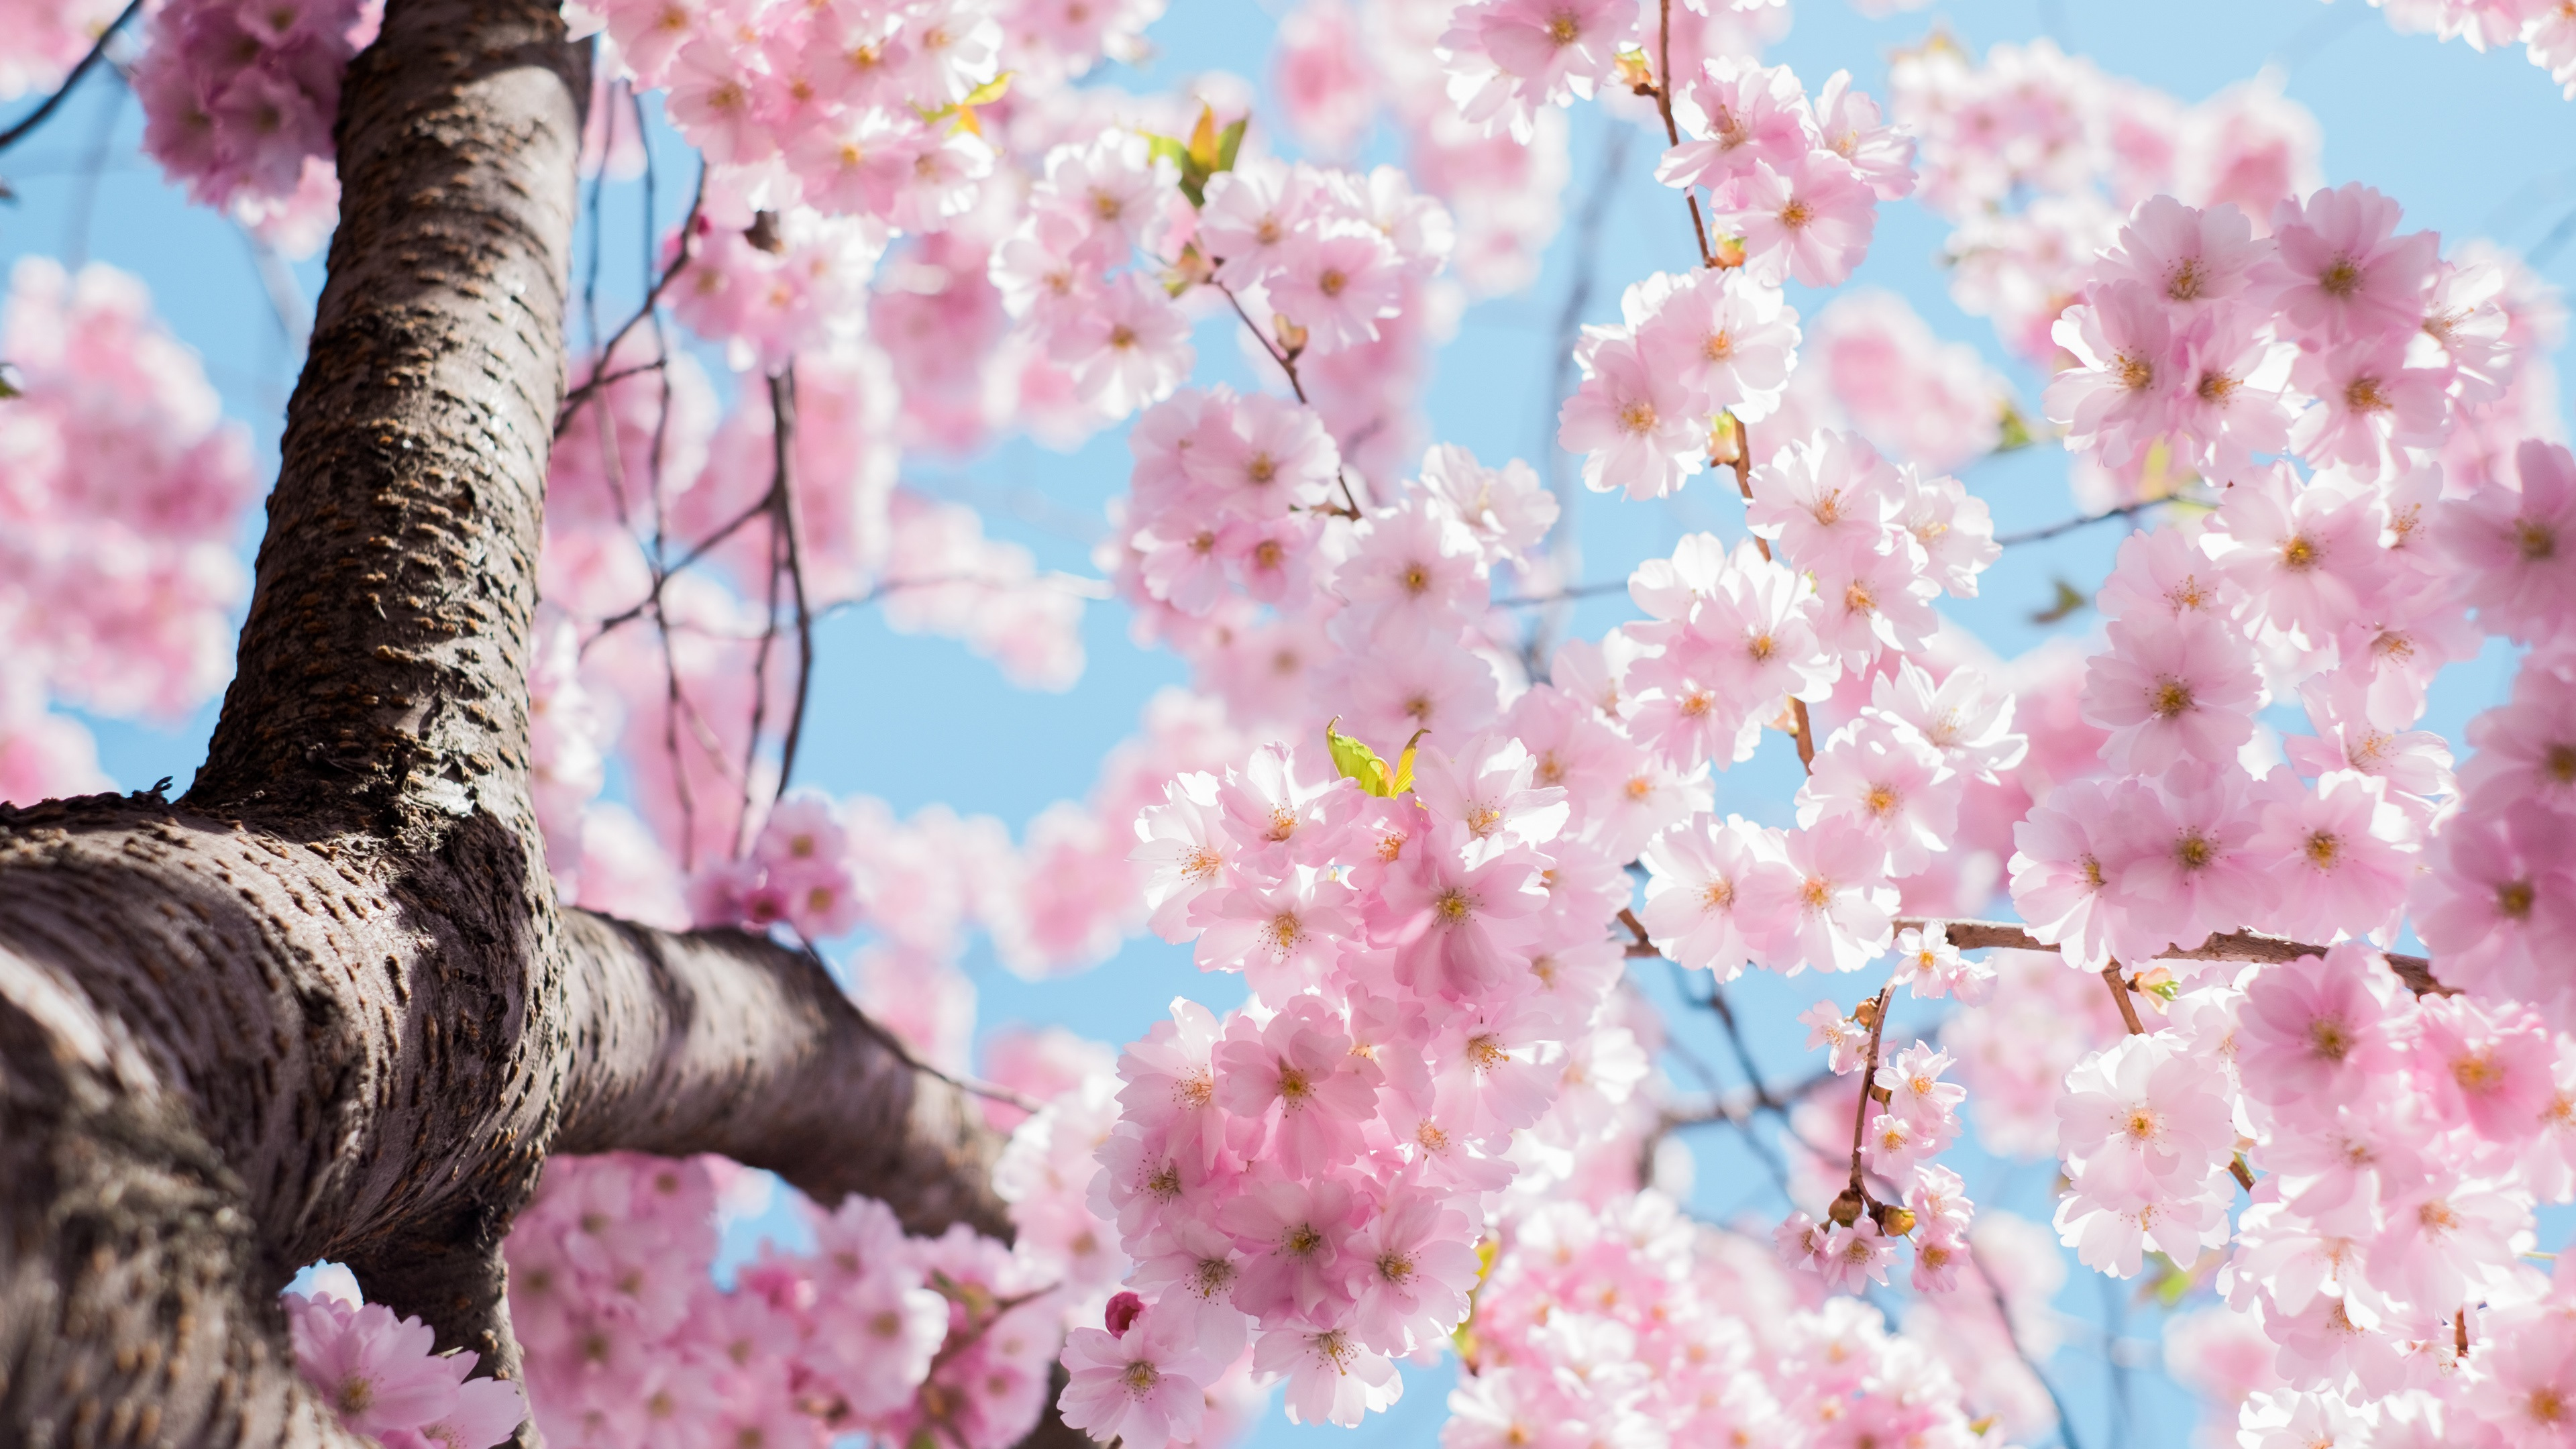 1608104968.0645Cherry-flowers-blossom-tree-twigs-spring_3840x2160.jpg